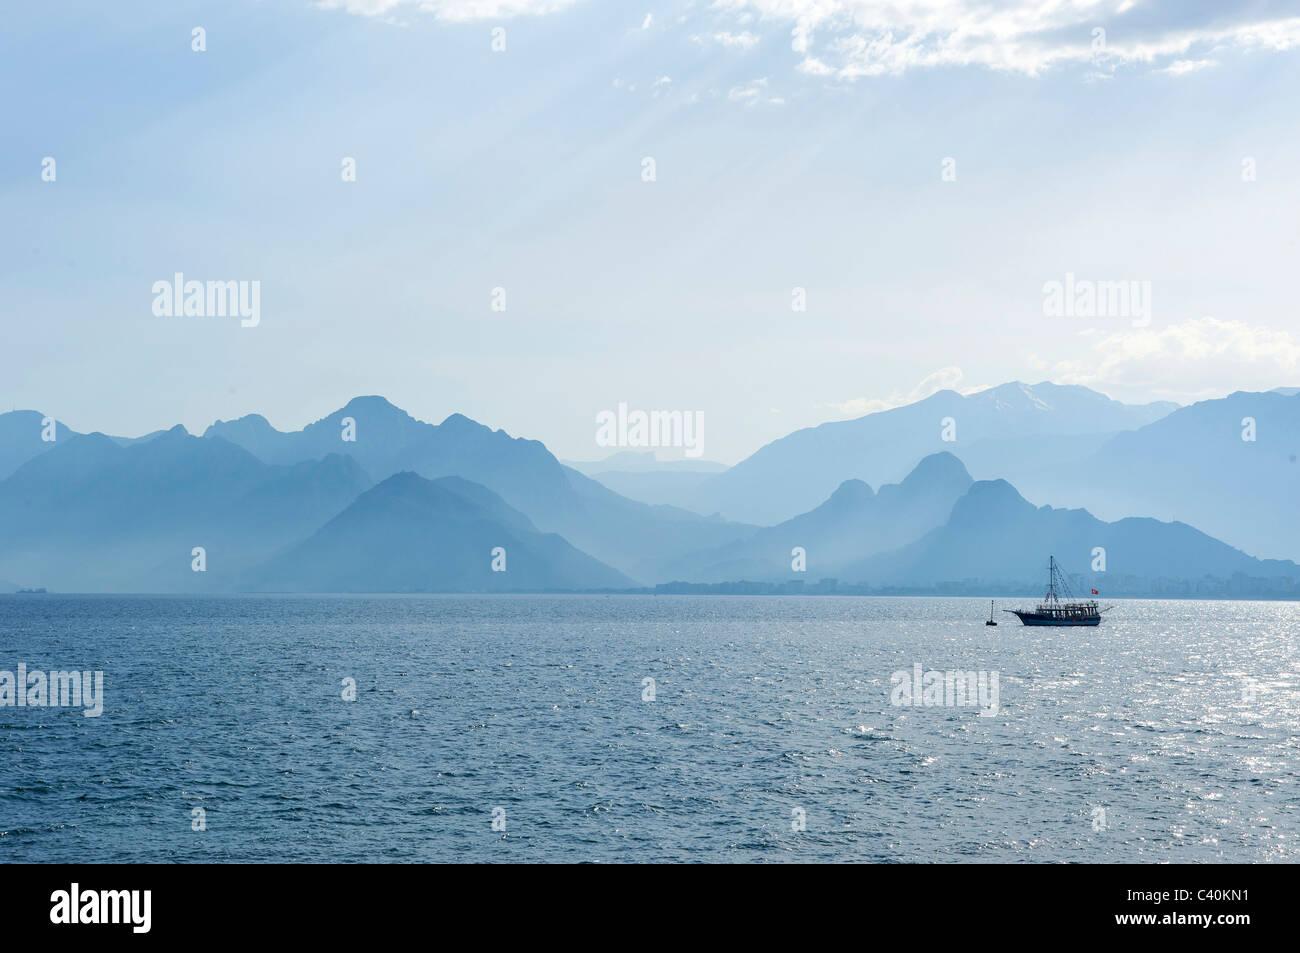 Turkish, Riviera, look, glance, bay, Bey Daglari, Beydaglan mountains, Antalya, Turkish Riviera, Turkey, sea - Stock Image